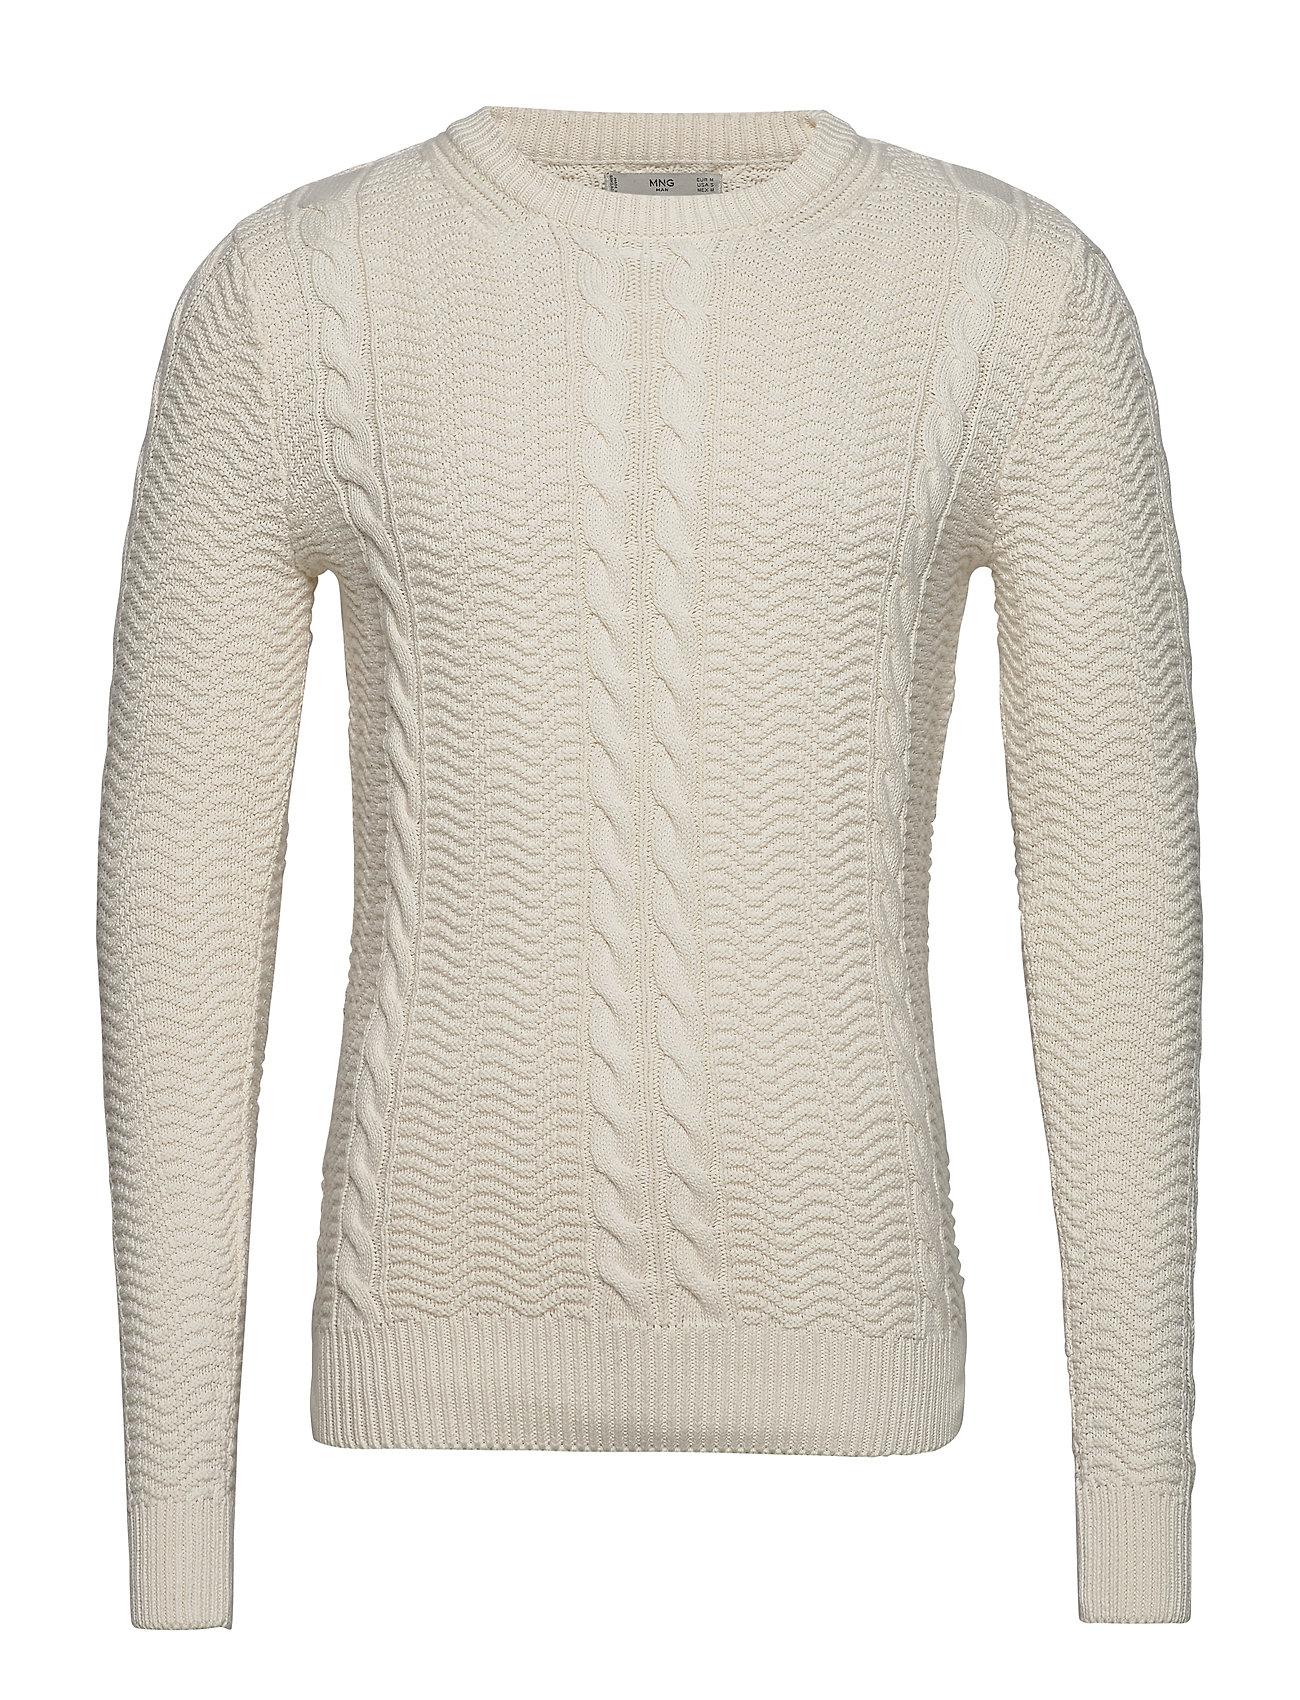 Mango Man Braided cotton sweater - NATURAL WHITE